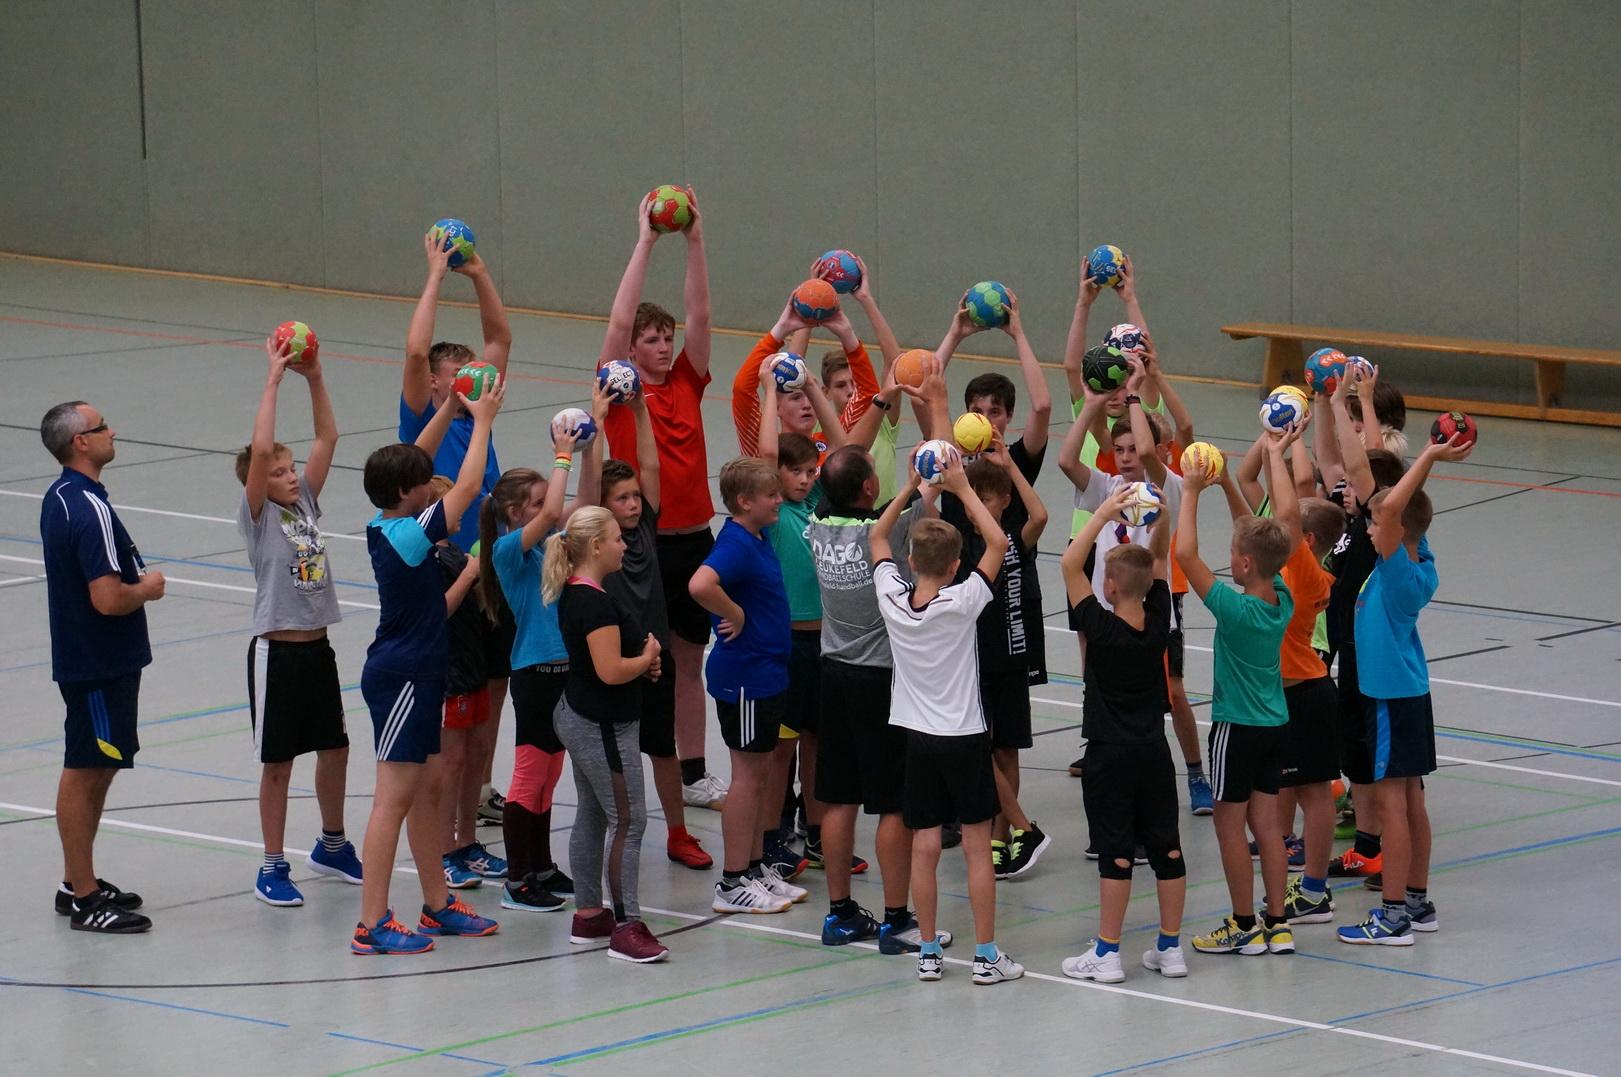 201808_Handballcamp_SDH_MG_085w